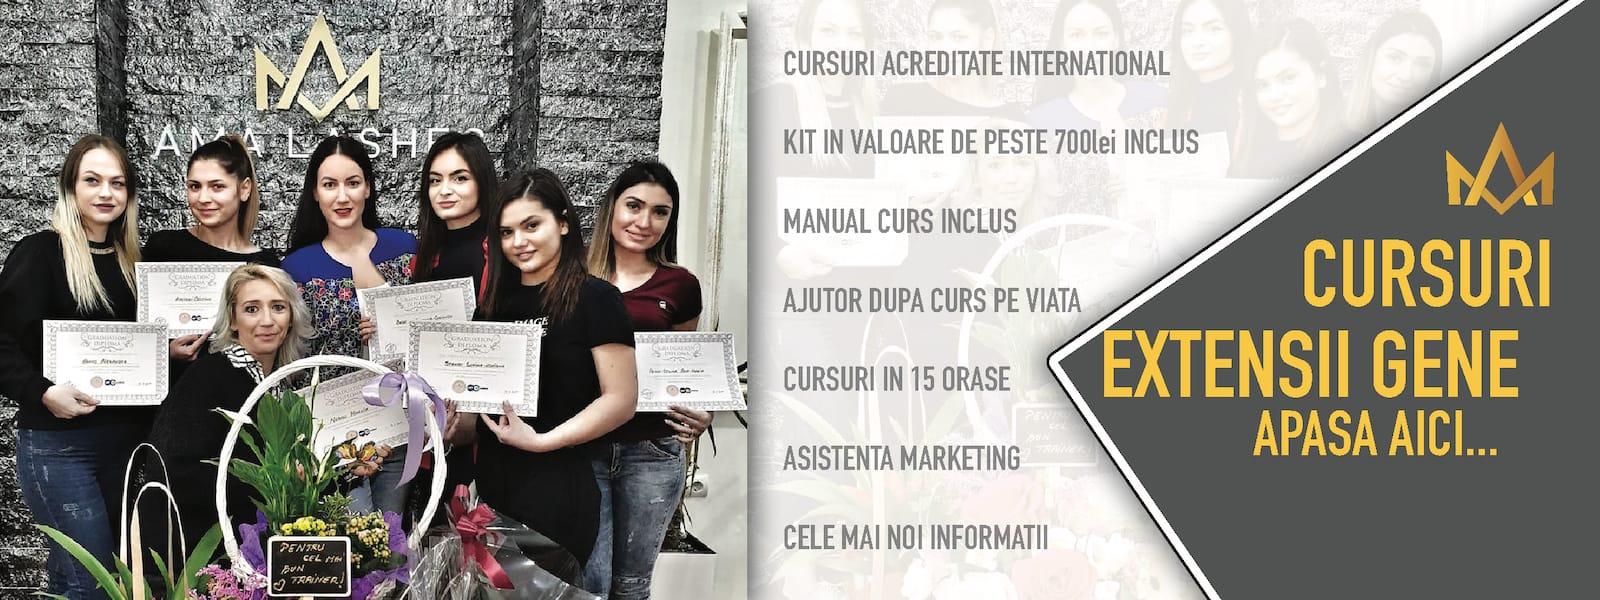 Cursuri-extensii-gene-AMA-Lashes-Academy-Romania-Constanta-Bucuresti-Cluj-Timisoara-Suceava-Neamt-Alba-Mures-Gorj-Maramures-Caras-Severin-Dambovita-Pitesti